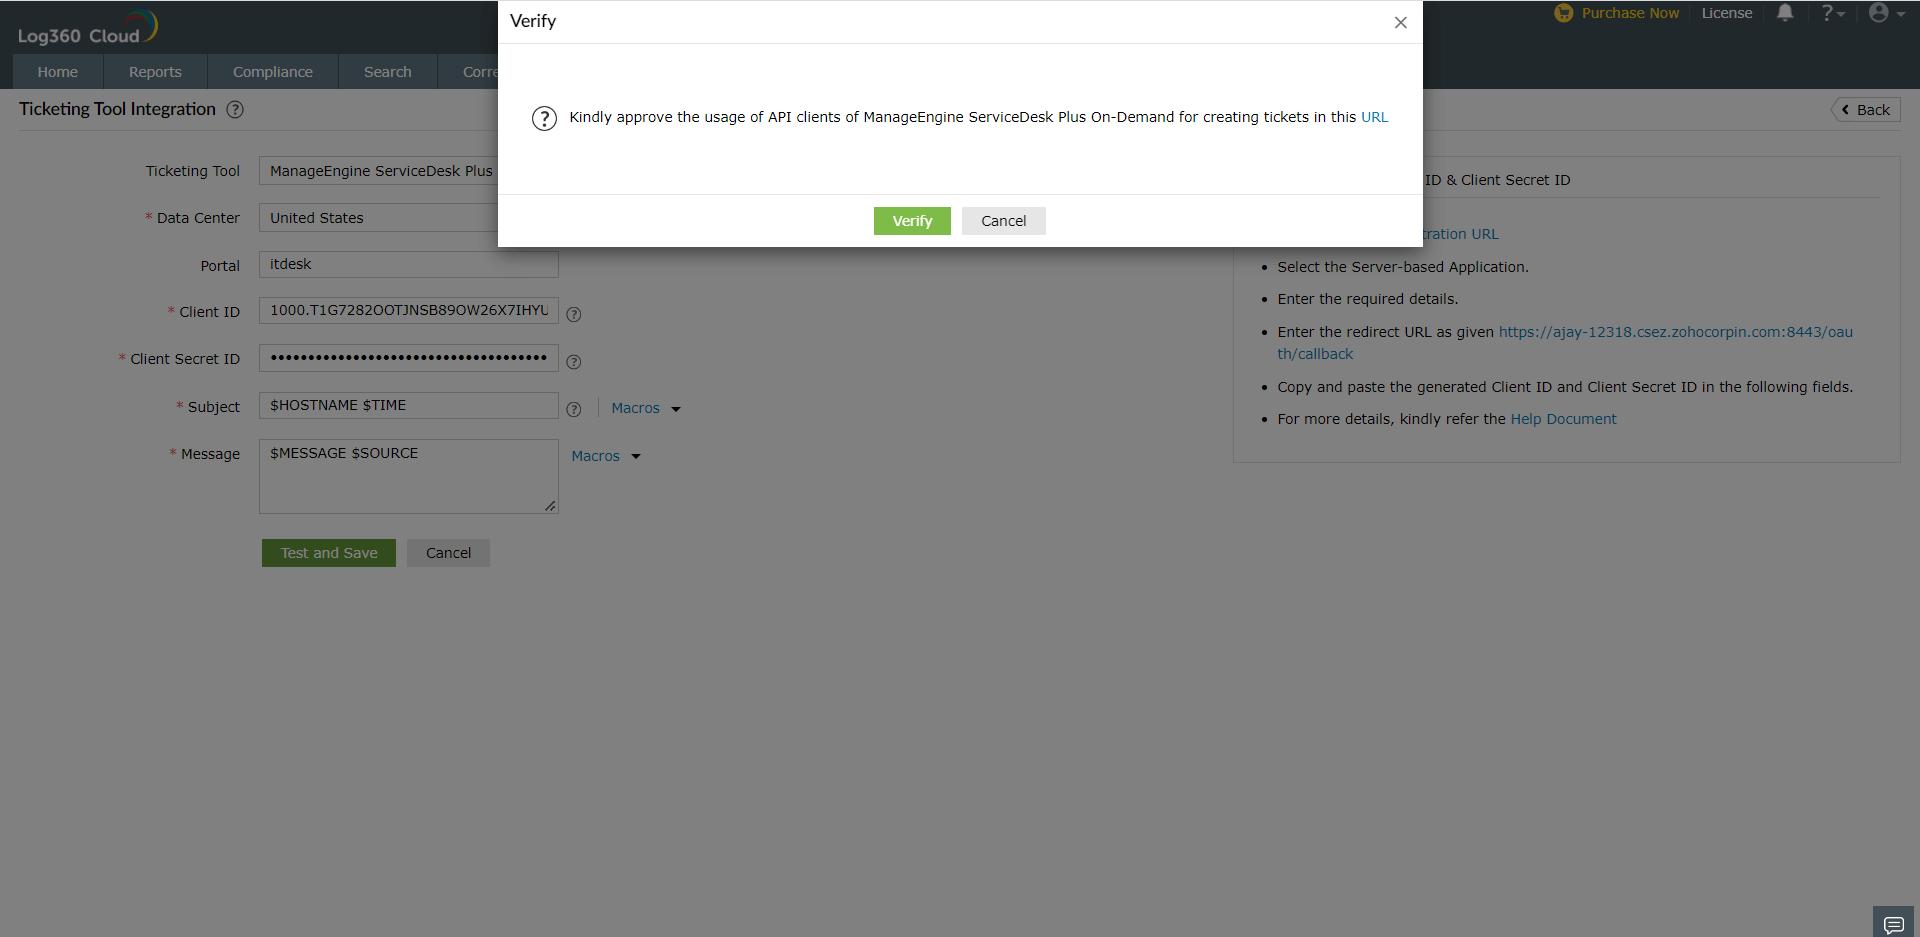 ticketing-tool-Integration